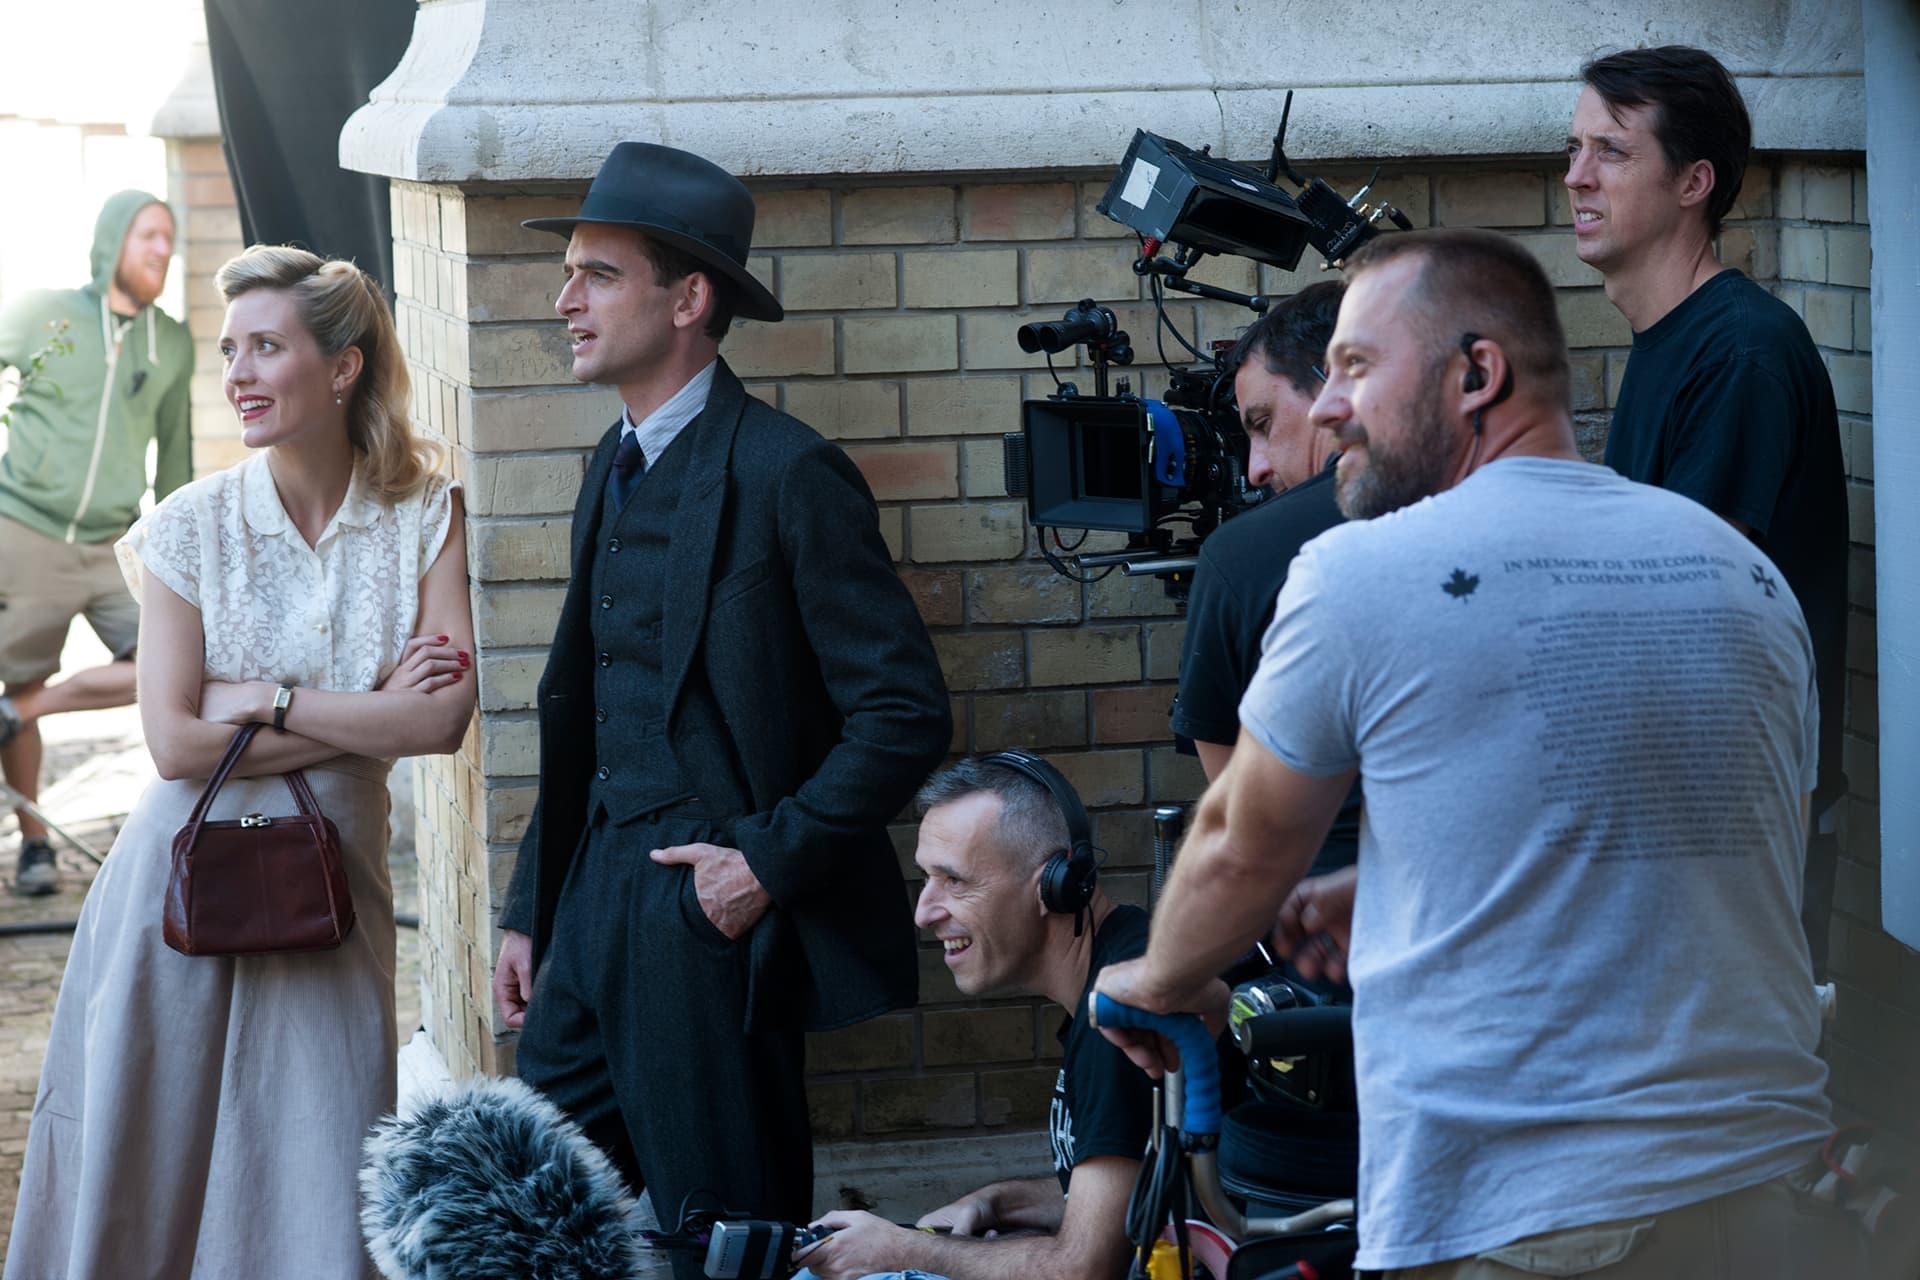 Evelyne Brochu (Aurora) and Jack Laskey (Alfred) with crew on the set of X Company Season 3.